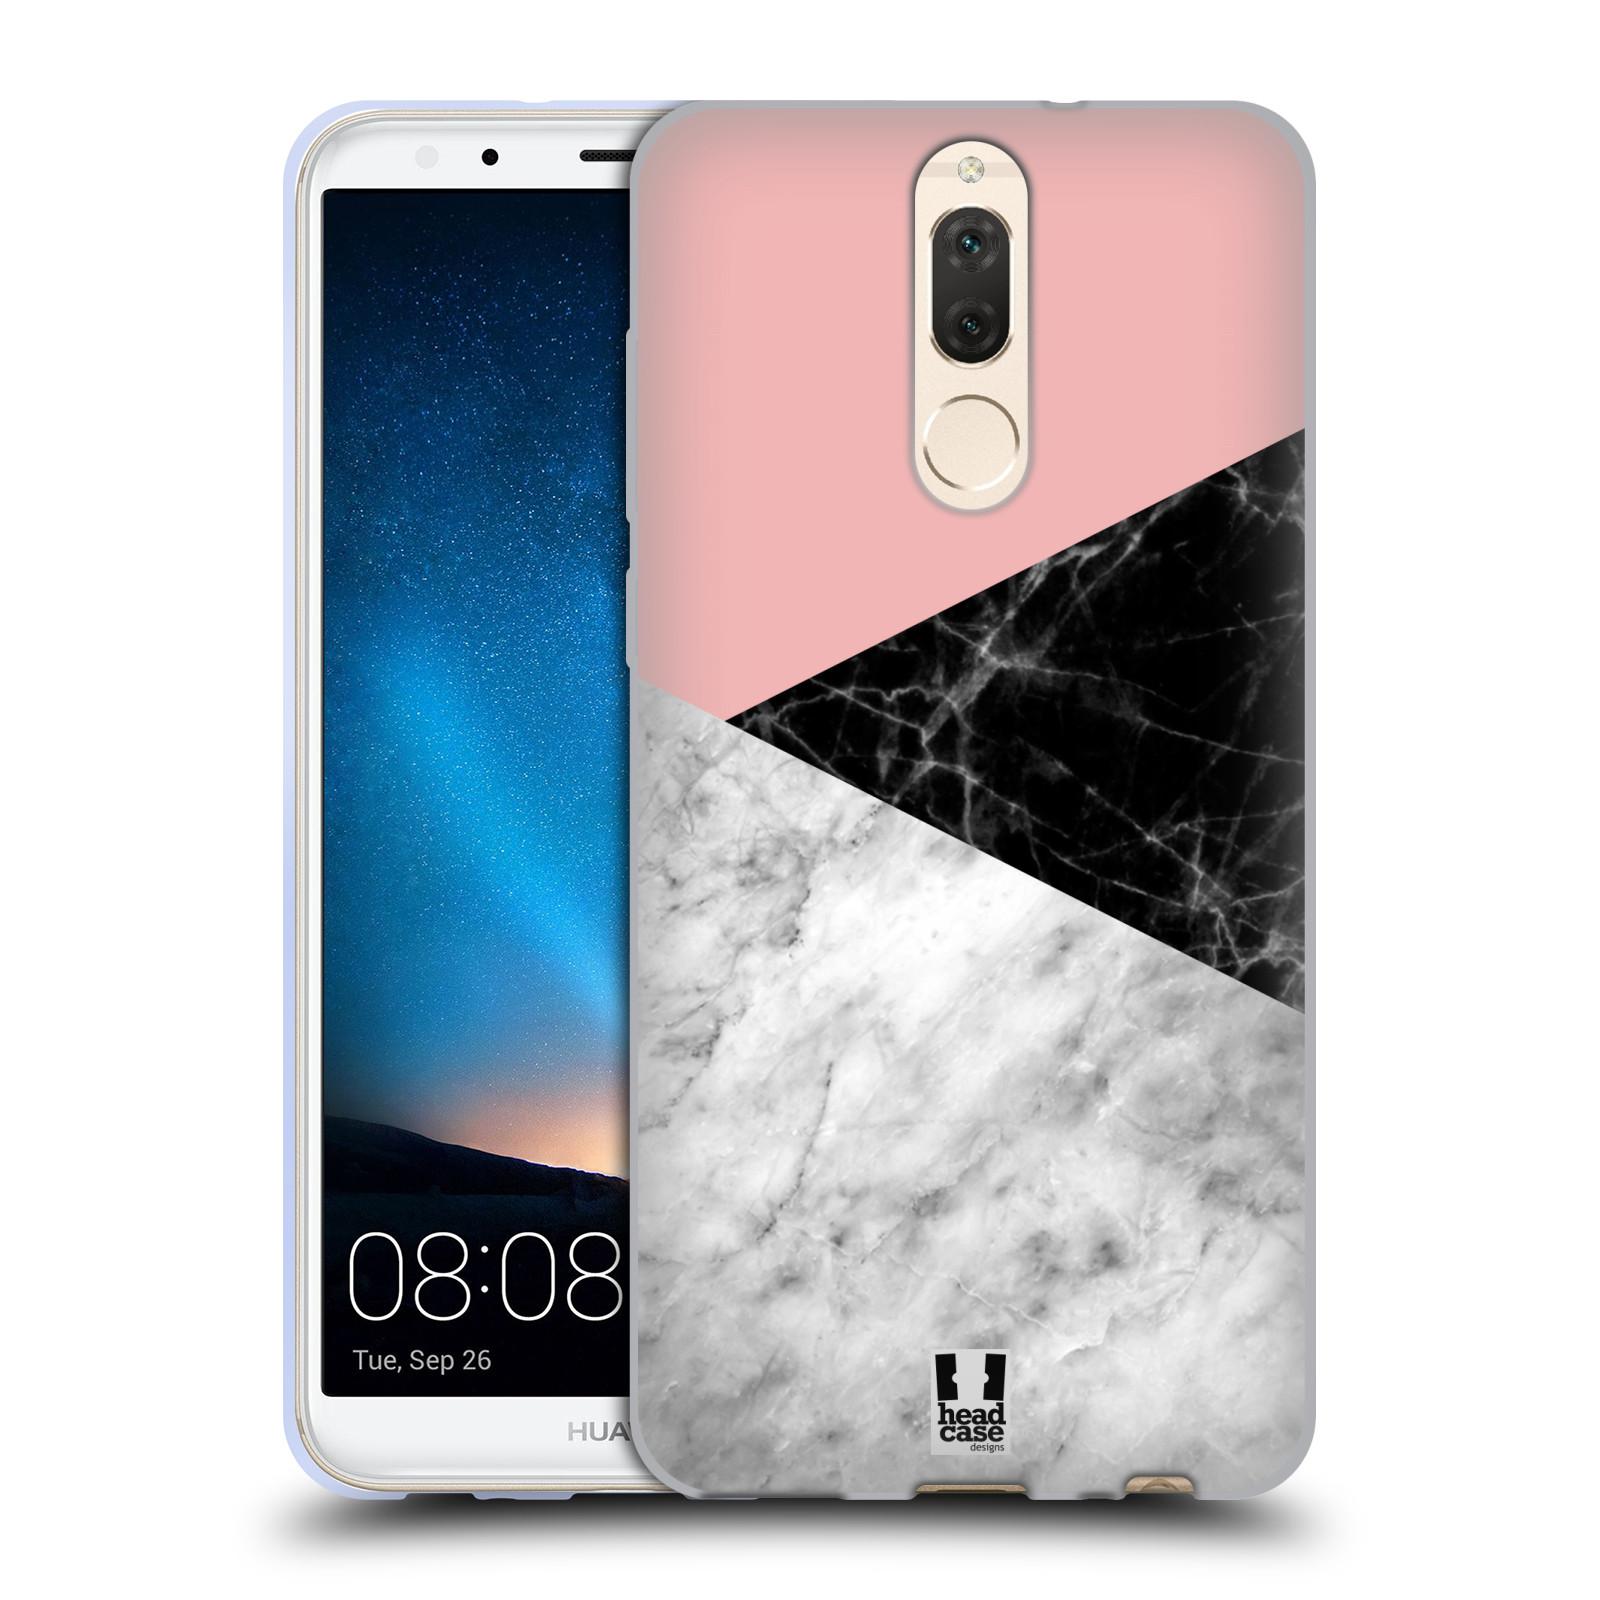 Silikonové pouzdro na mobil Huawei Mate 10 Lite - Head Case - Mramor mix